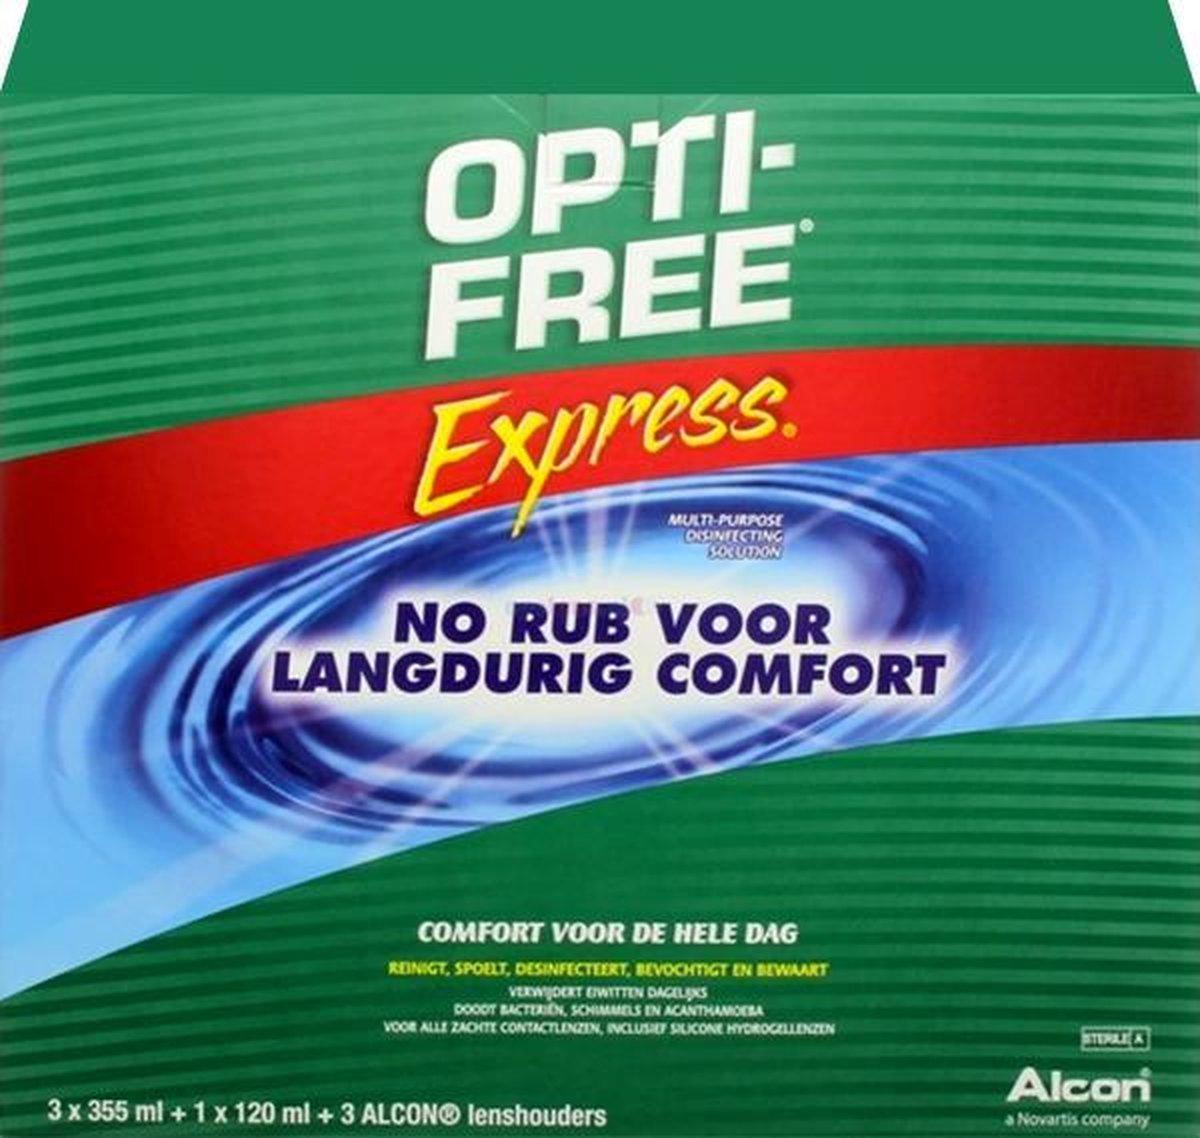 OPTI-FREE  Express  Multipack 3x355ml